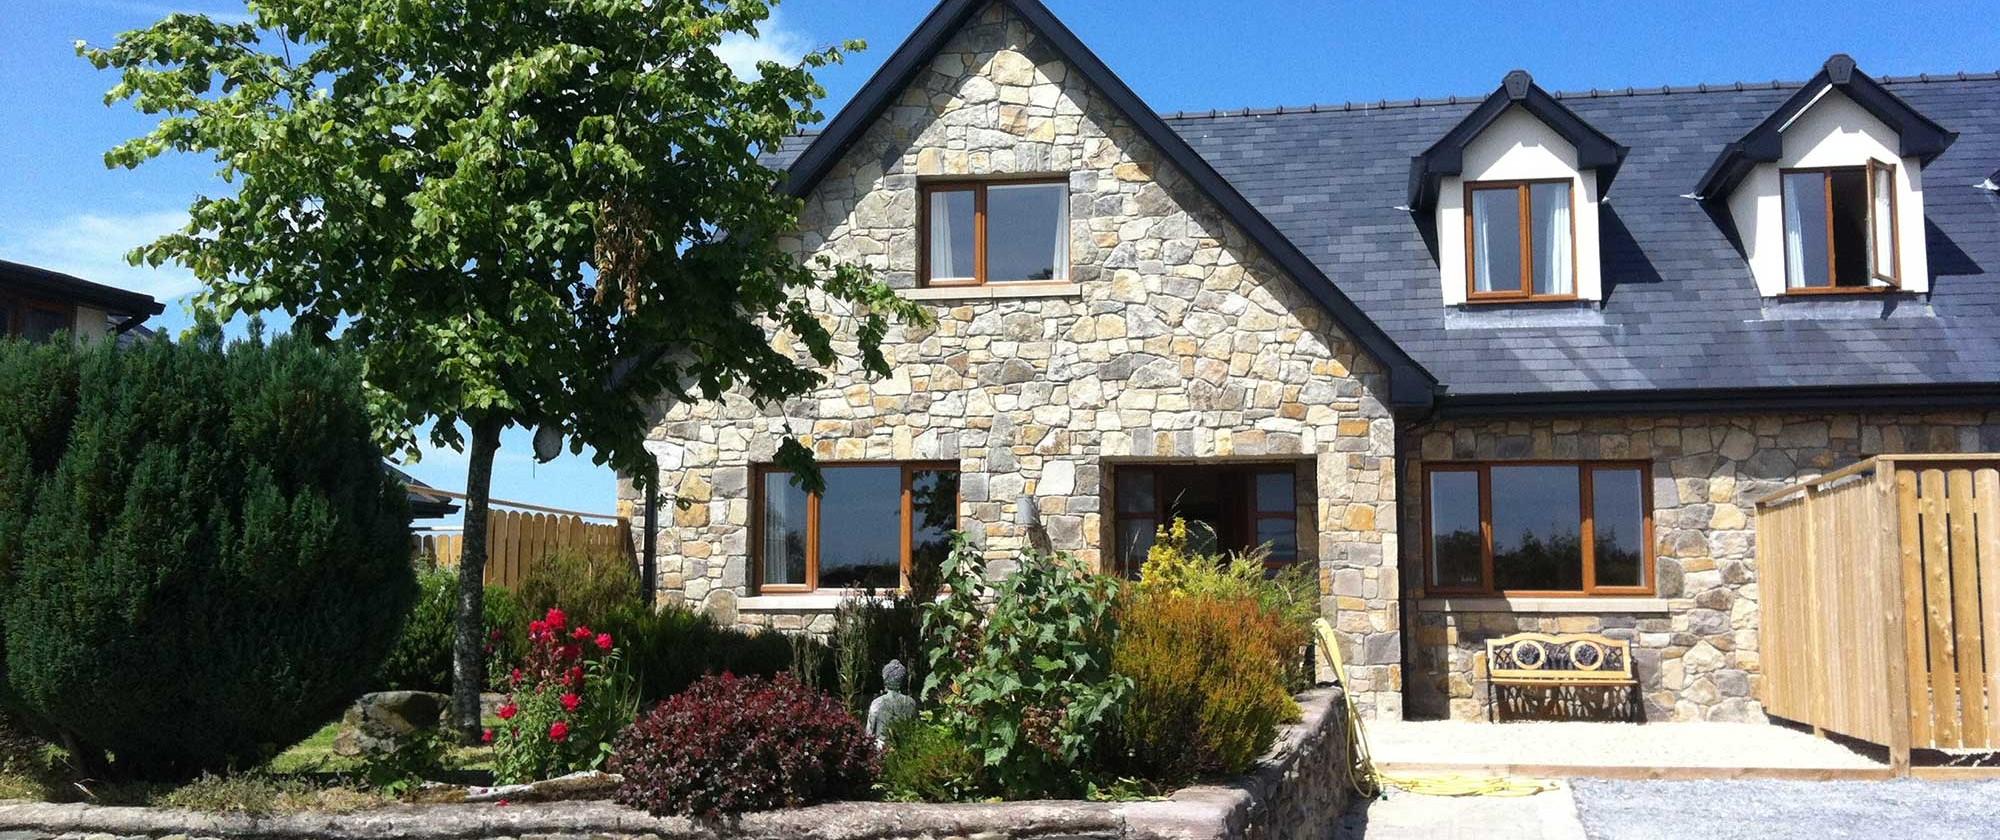 Using beautiful Donegal Sandstone & Blue Banger natural slates